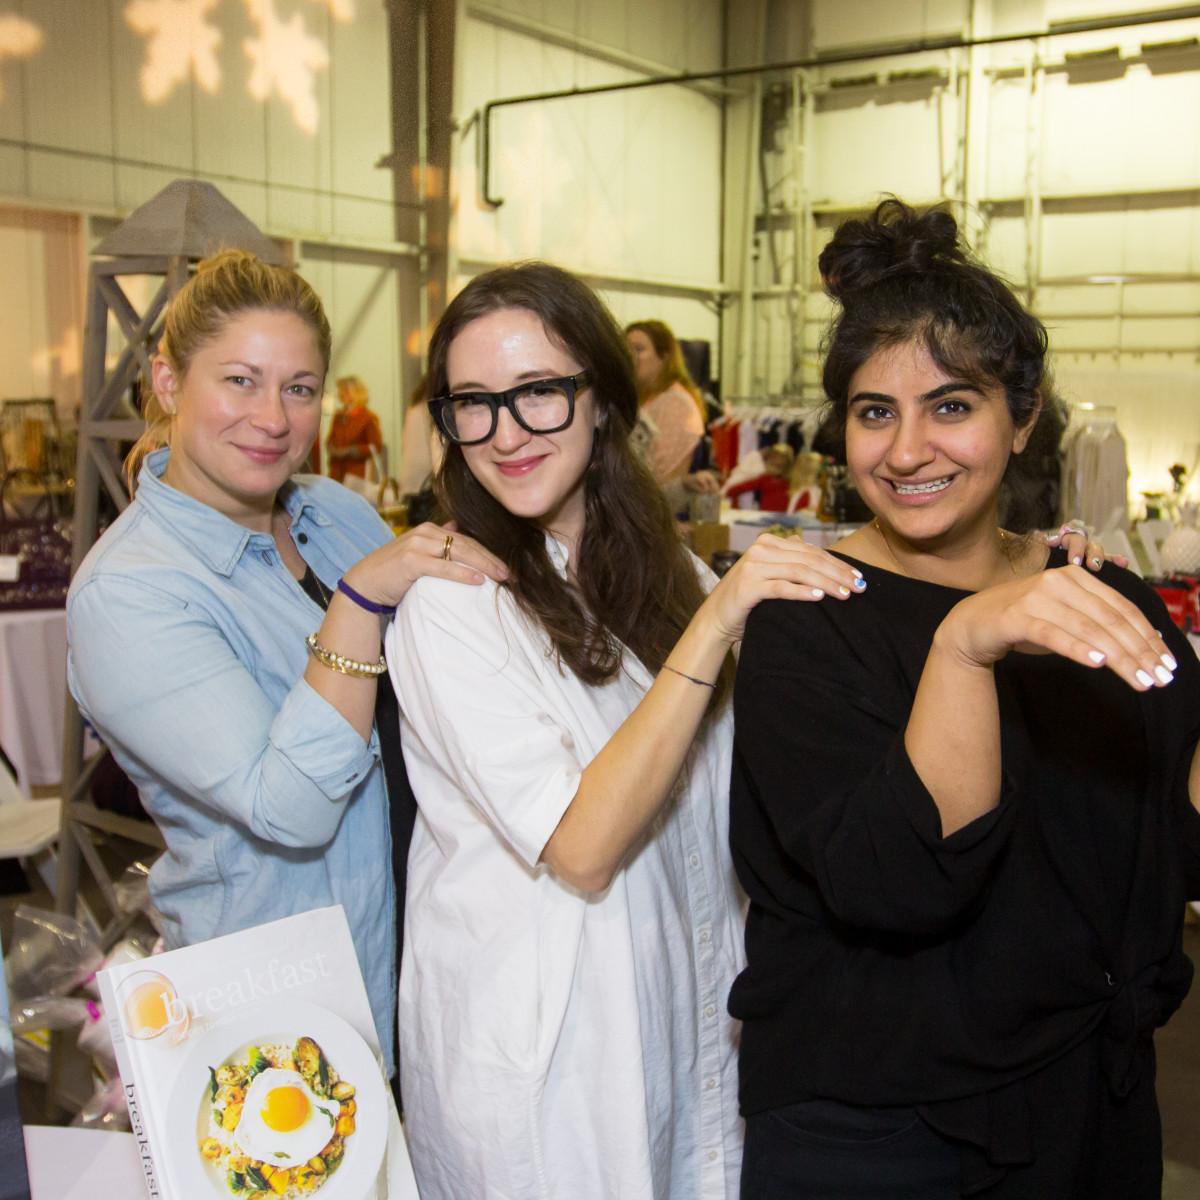 News, CM Holiday Pop-Up Shop, Dec. 2015, Julie Cushman, Cecilia Marquez, Sanaa Sahi